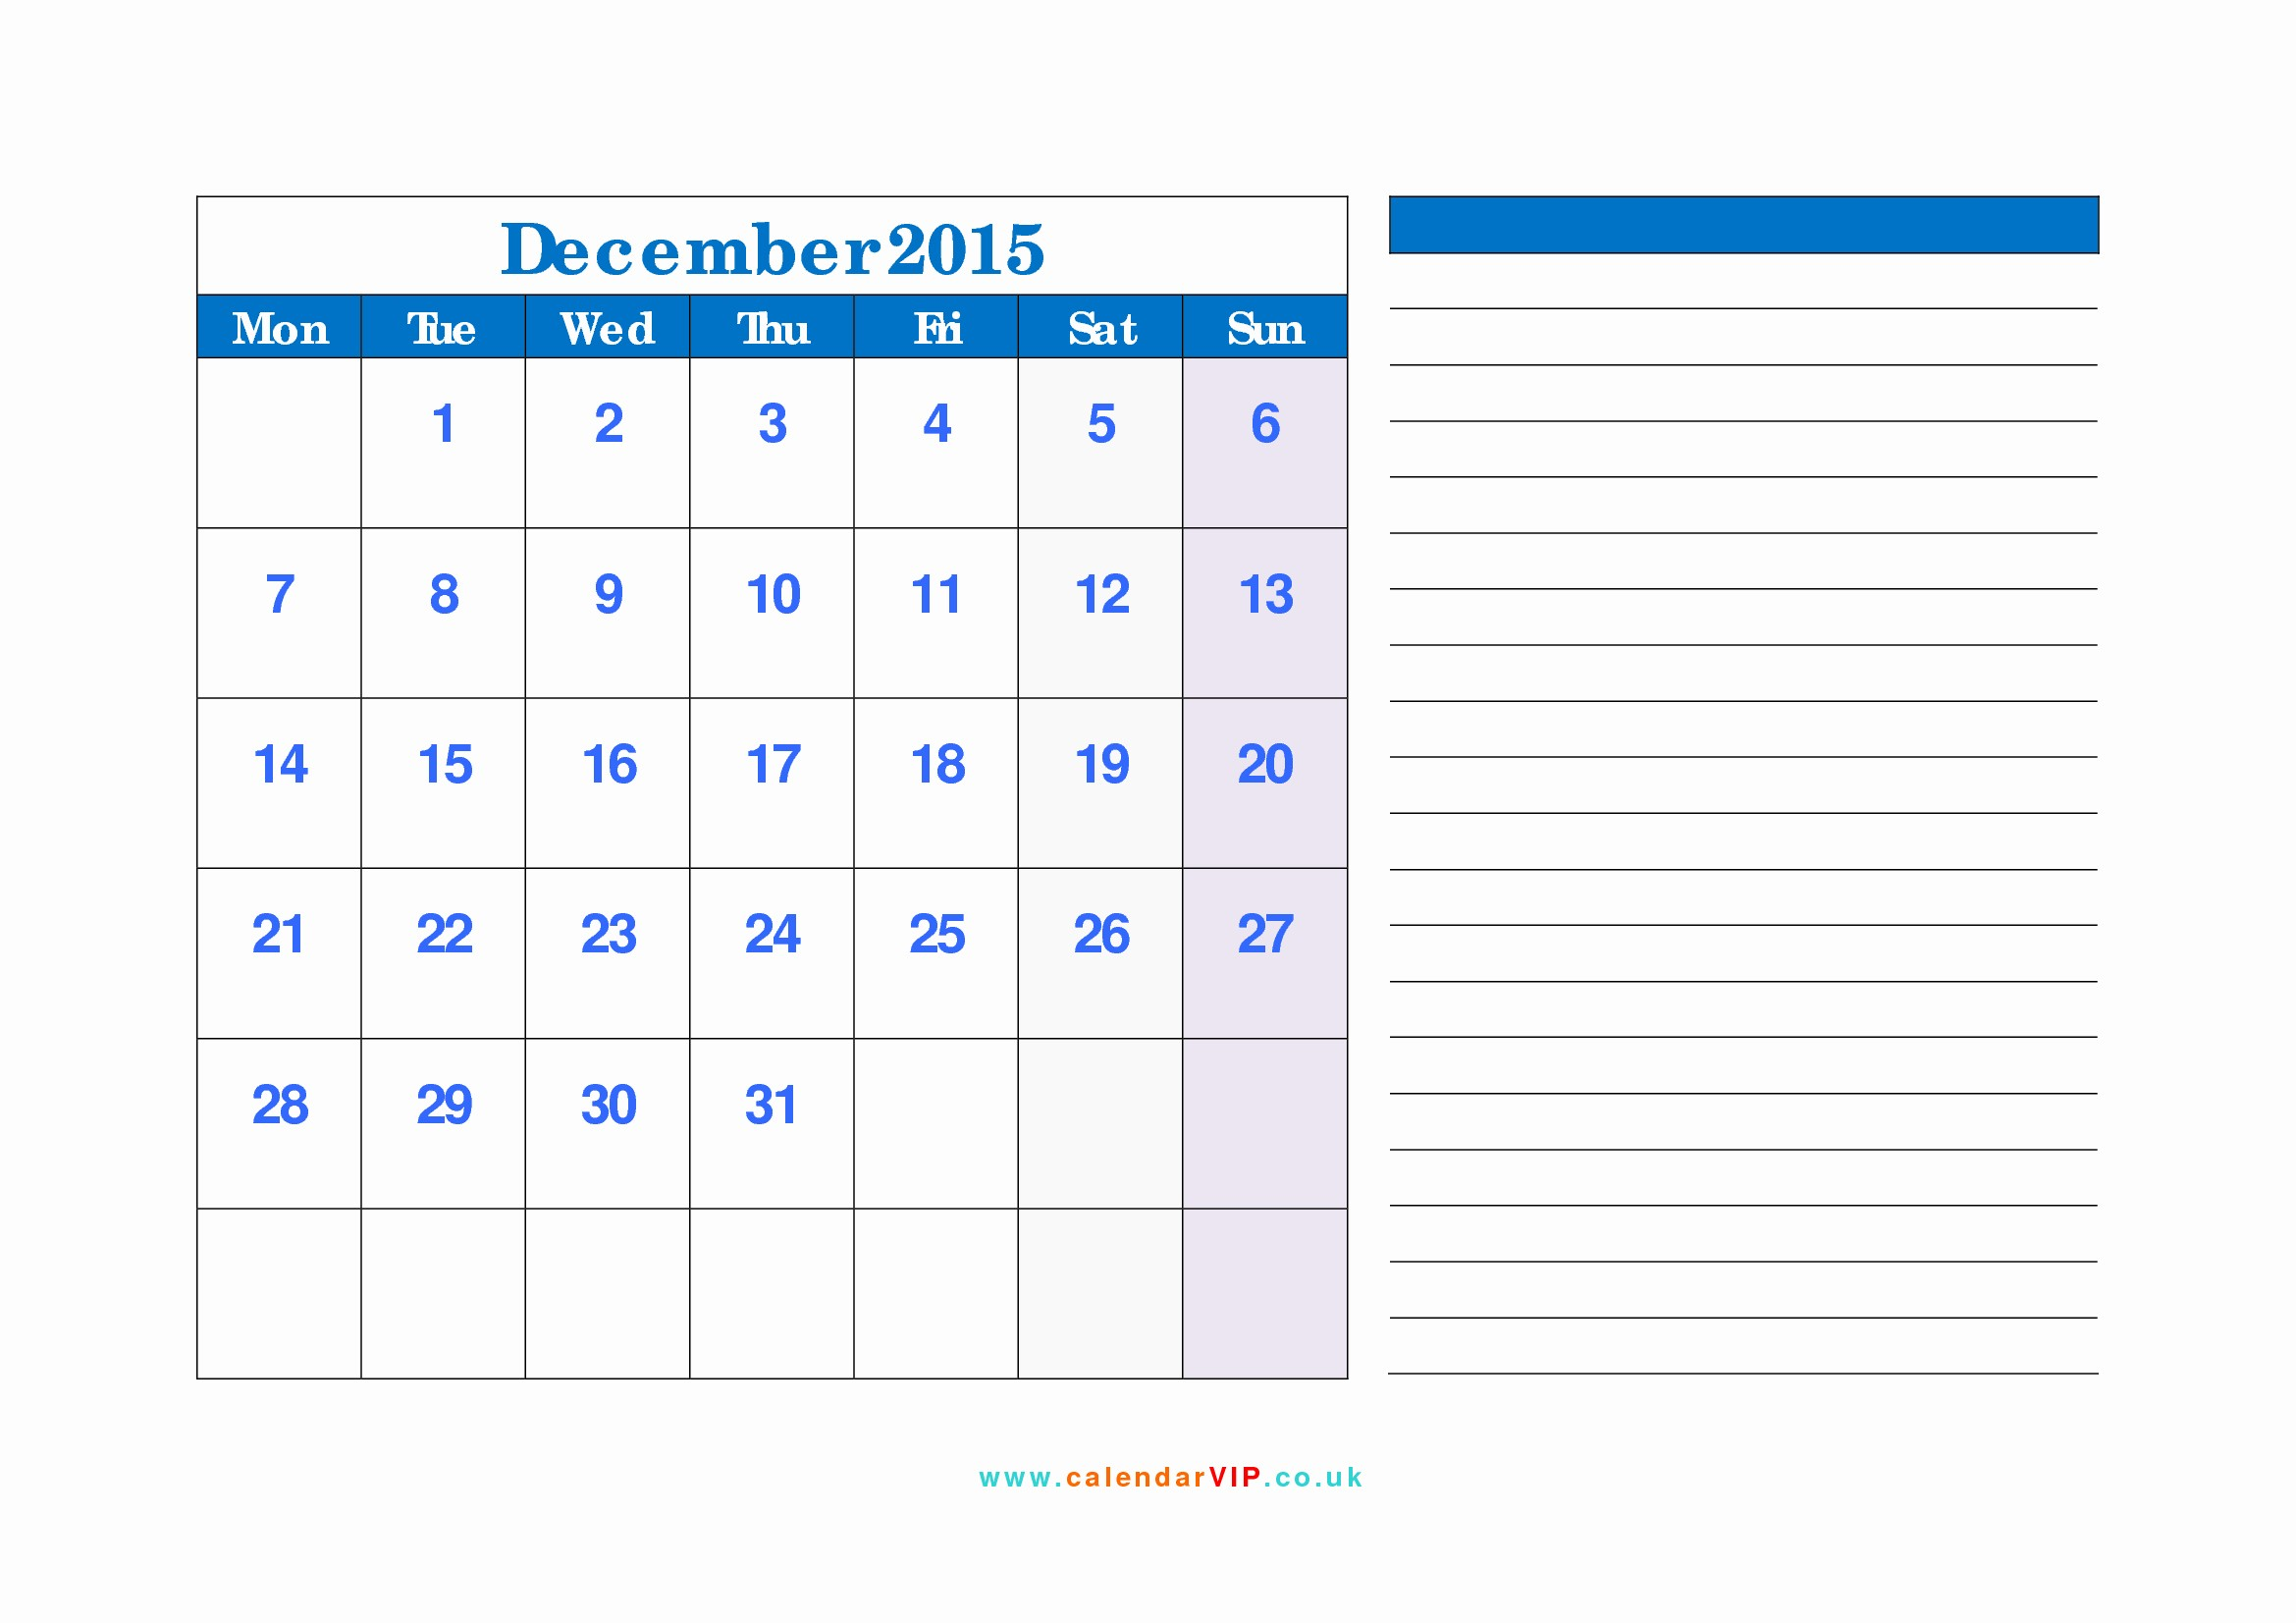 December 2015 Calendar Word Document Awesome December 2015 Calendar Free Monthly Calendar Templates